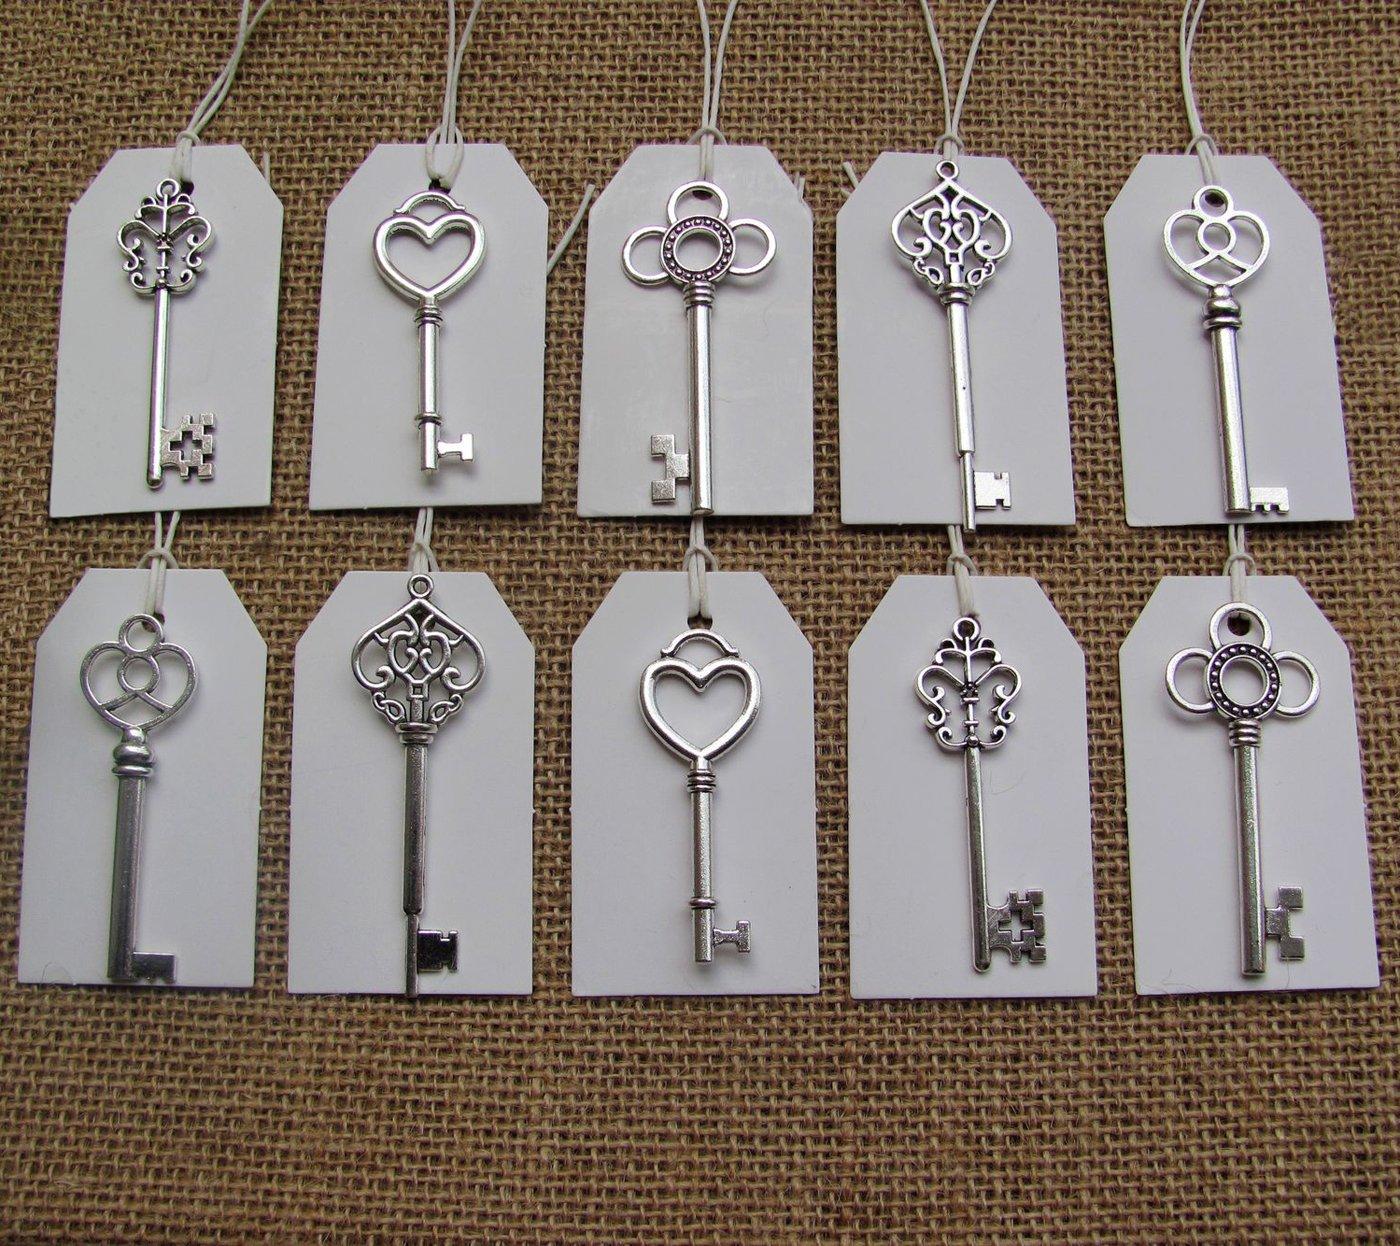 SL crafts Mixed 100pcs Antique Silver Skeleton Keys & 100 pcs White Tags Key Charms Pendants Wedding favor 53mm-68mm by SL crafts (Image #4)